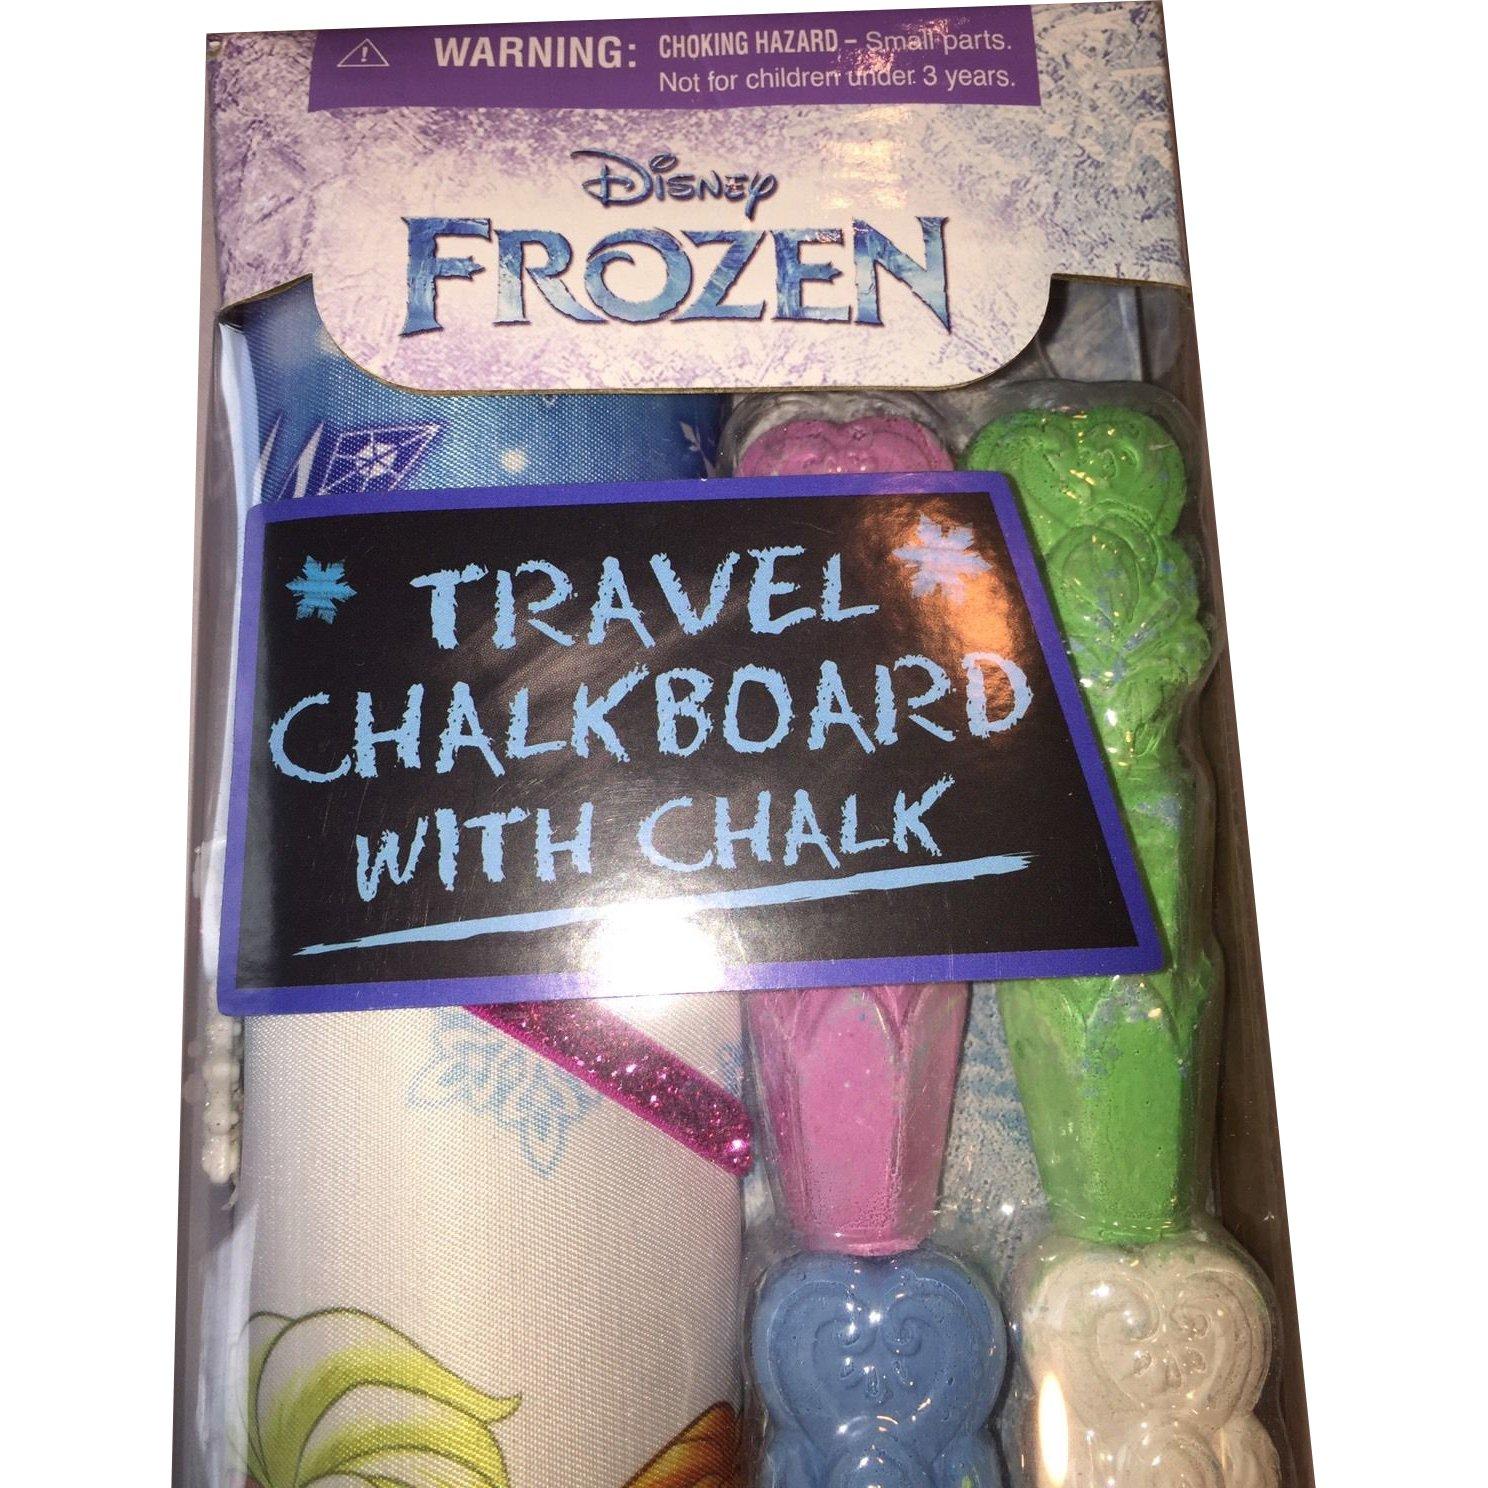 Disneys Frozen Travel Roll-Up Chalkboard Tara